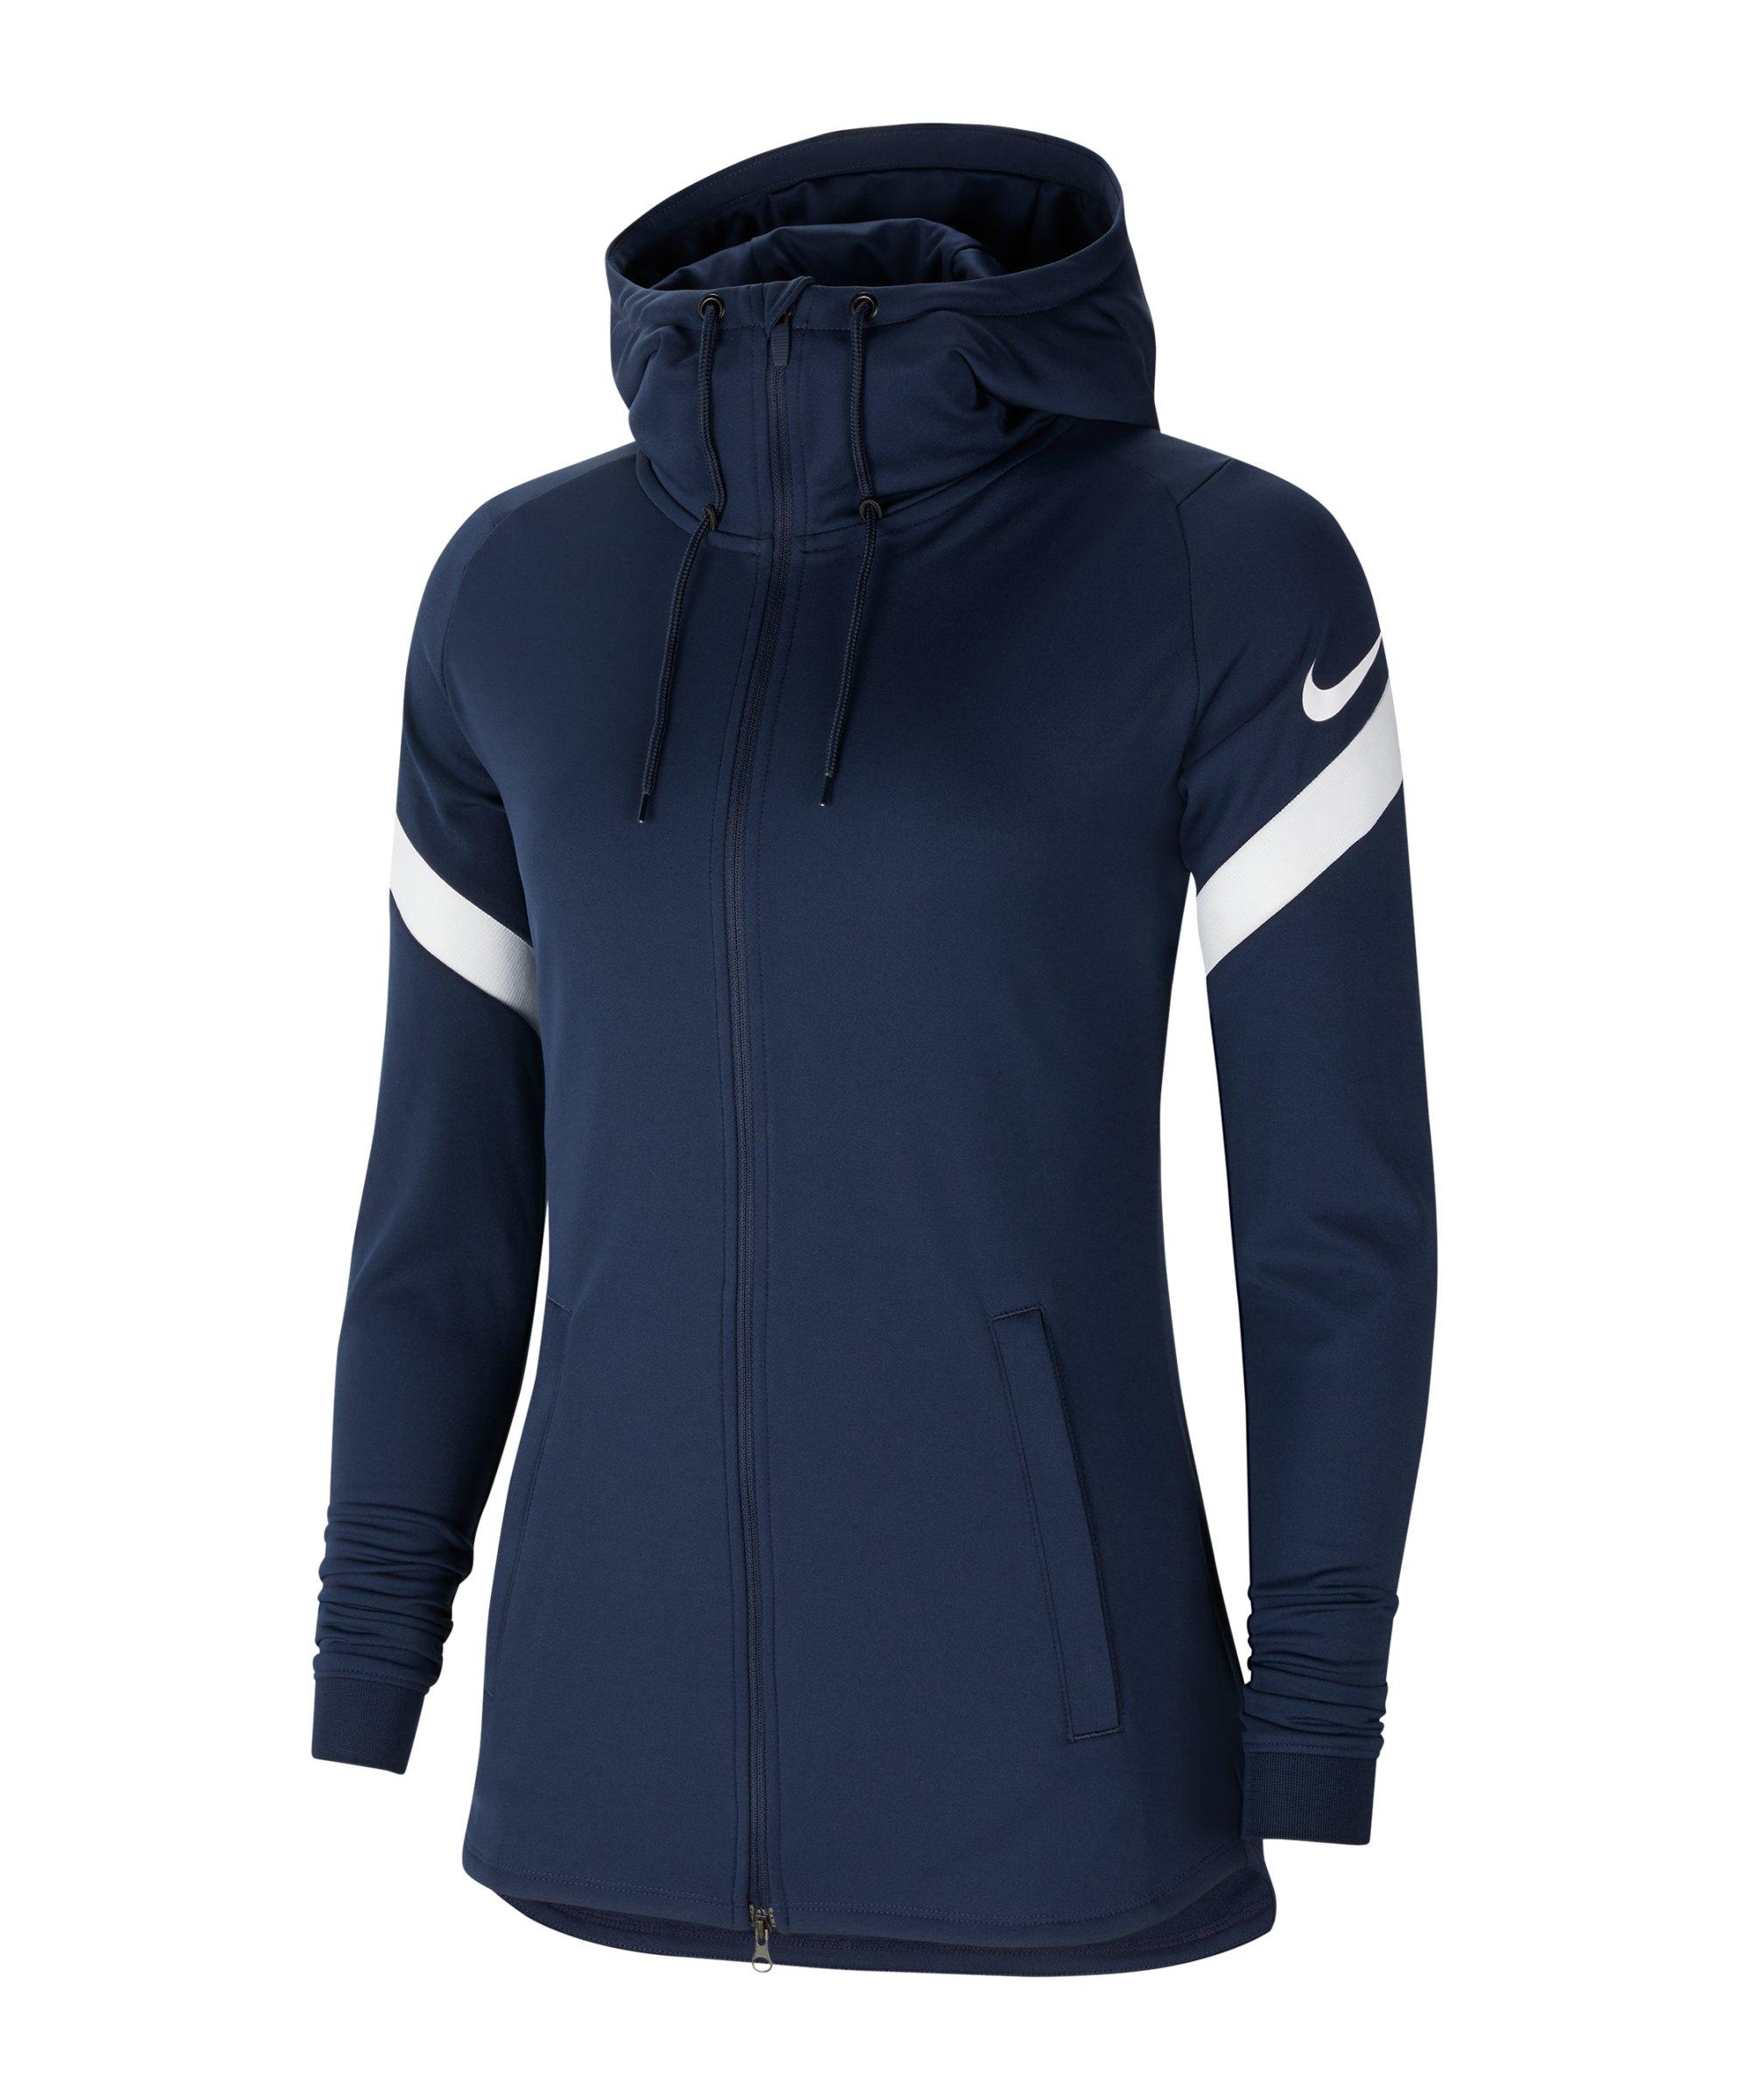 Nike Strike 21 Kapuzenjacke Damen Blau Weiss F451 - blau